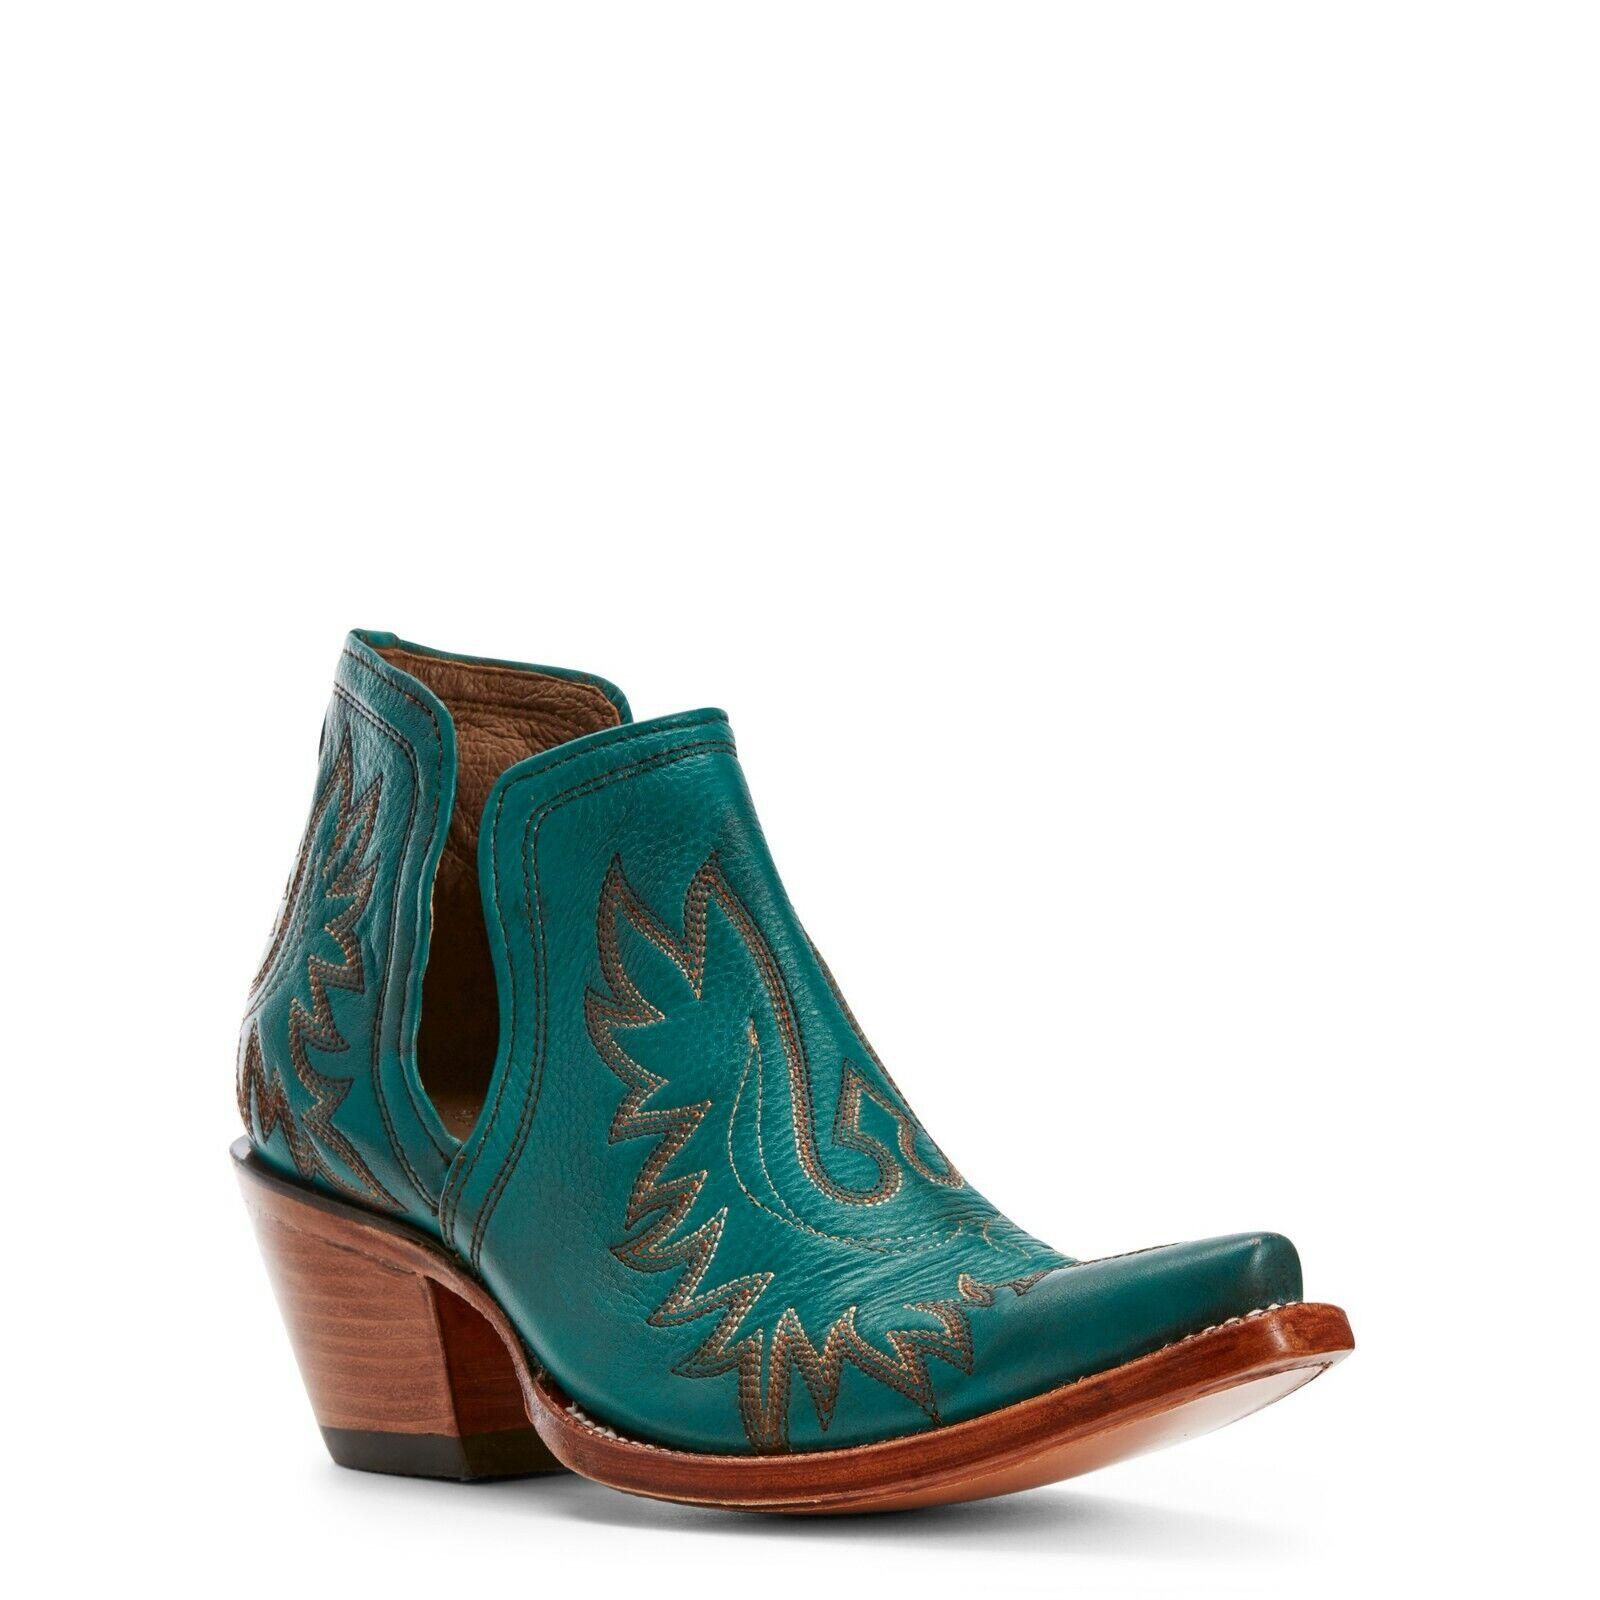 Ariat ® Damas Dixon Ágata verde botas al Tobillo occidental 10027280